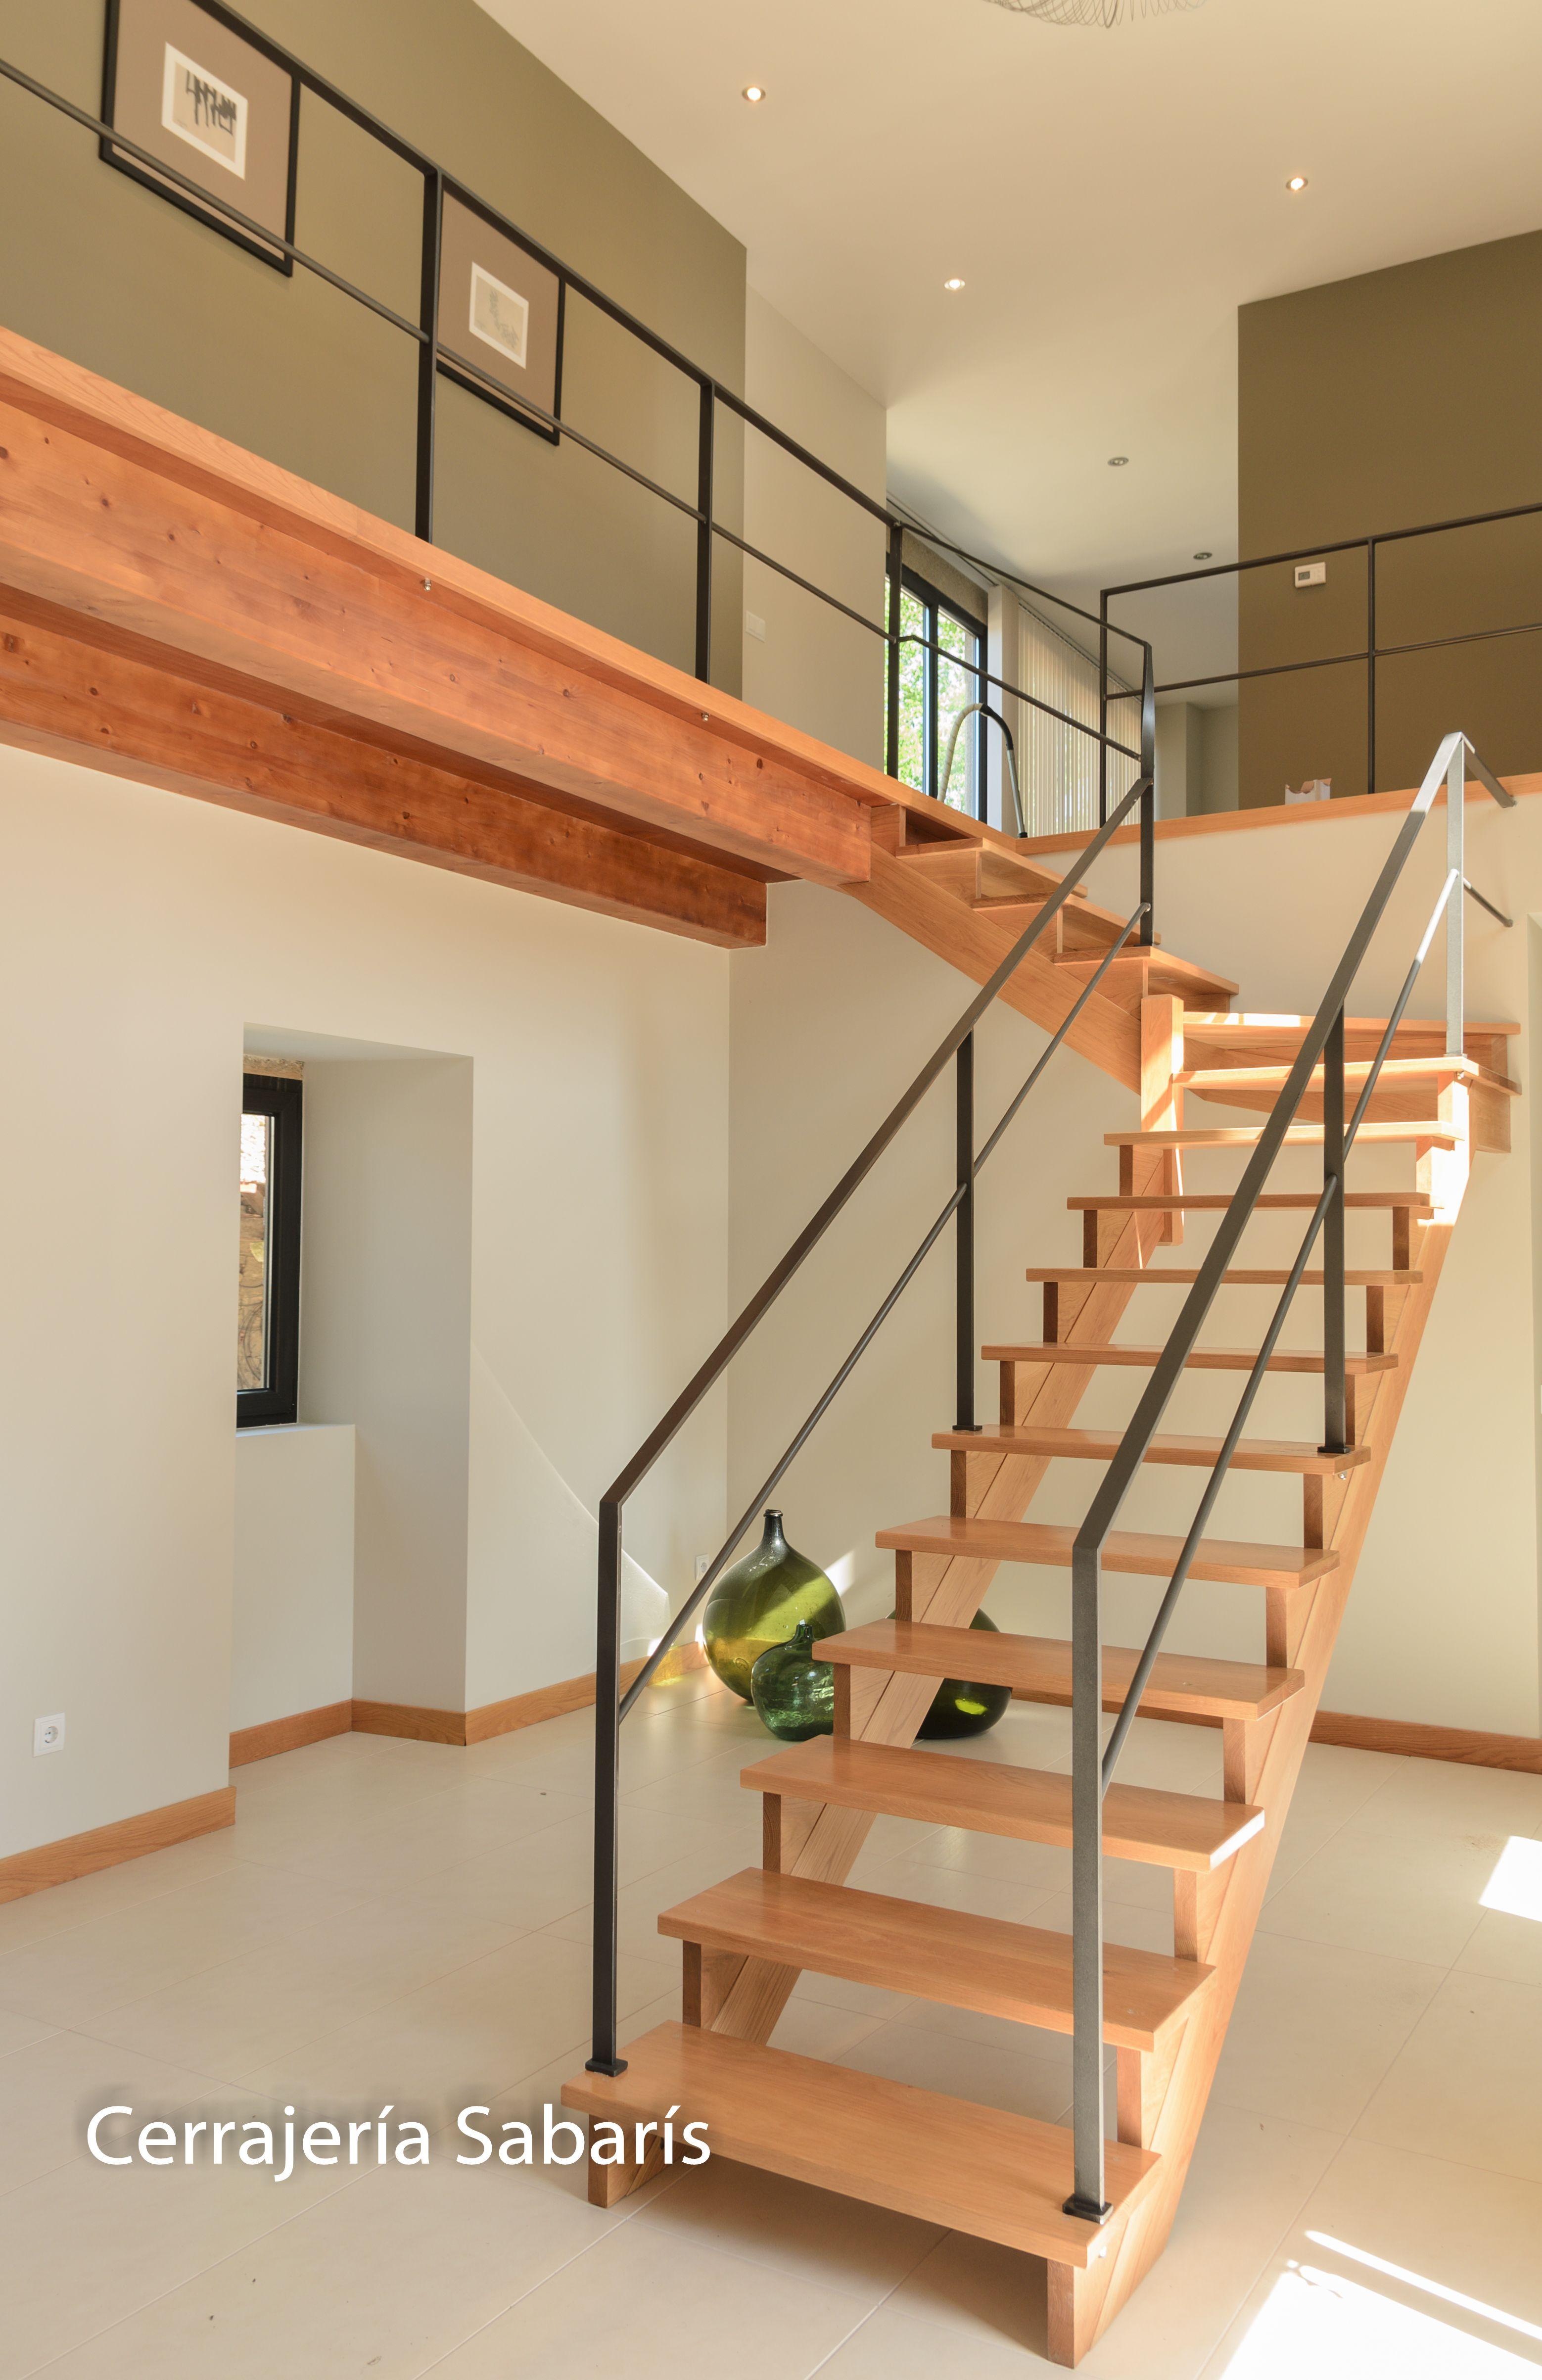 Barandilla para escalera de madera construida totalmente en pletina ...